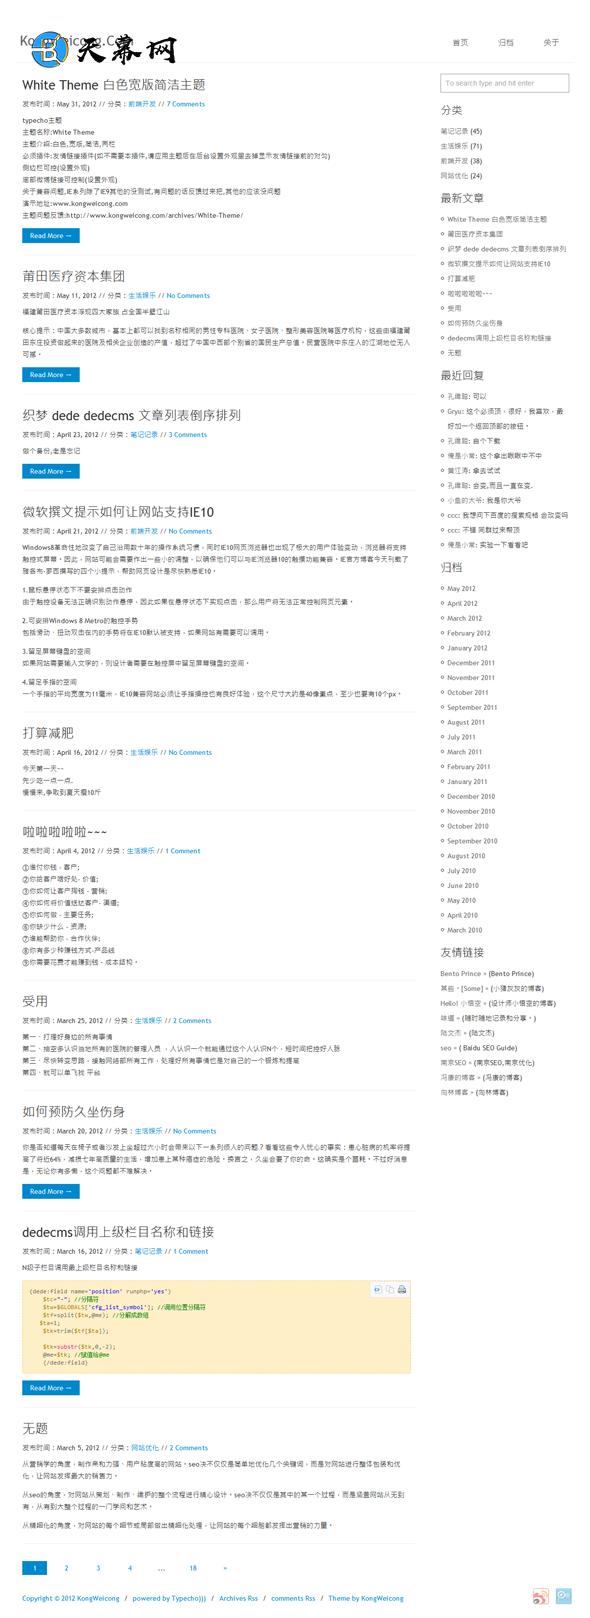 Typecho免费主题WhiteTheme白色宽版简洁模板 博客模板 第1张